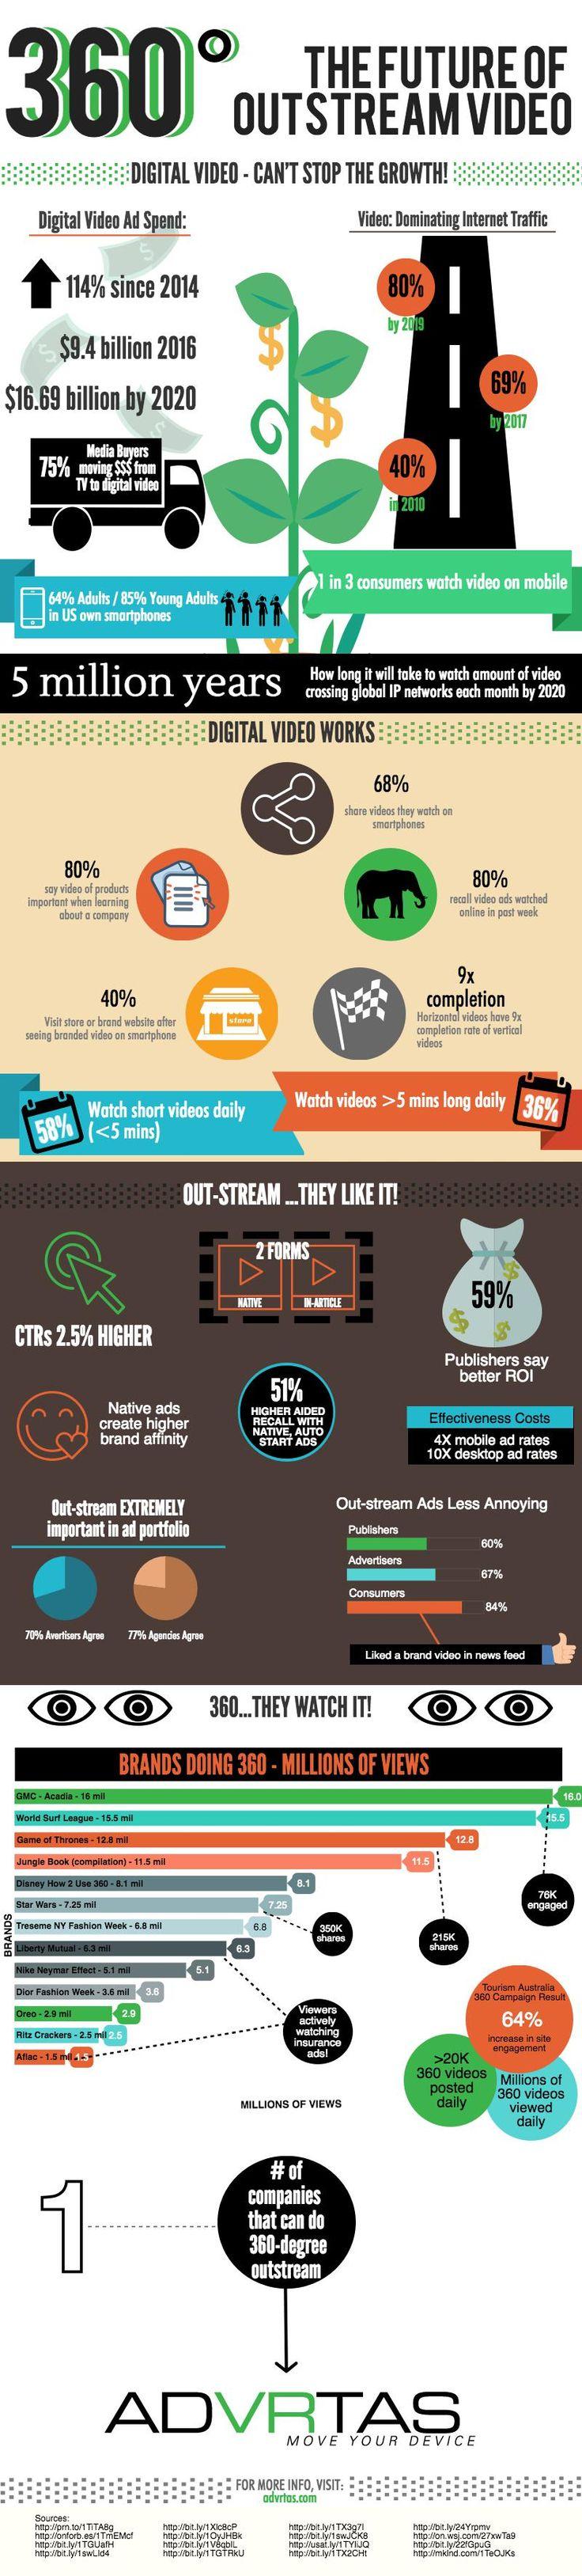 INFOGRAPHIC: Digital Video, Outstream Video & 360 Content | Robert Bruza | Pulse | LinkedIn